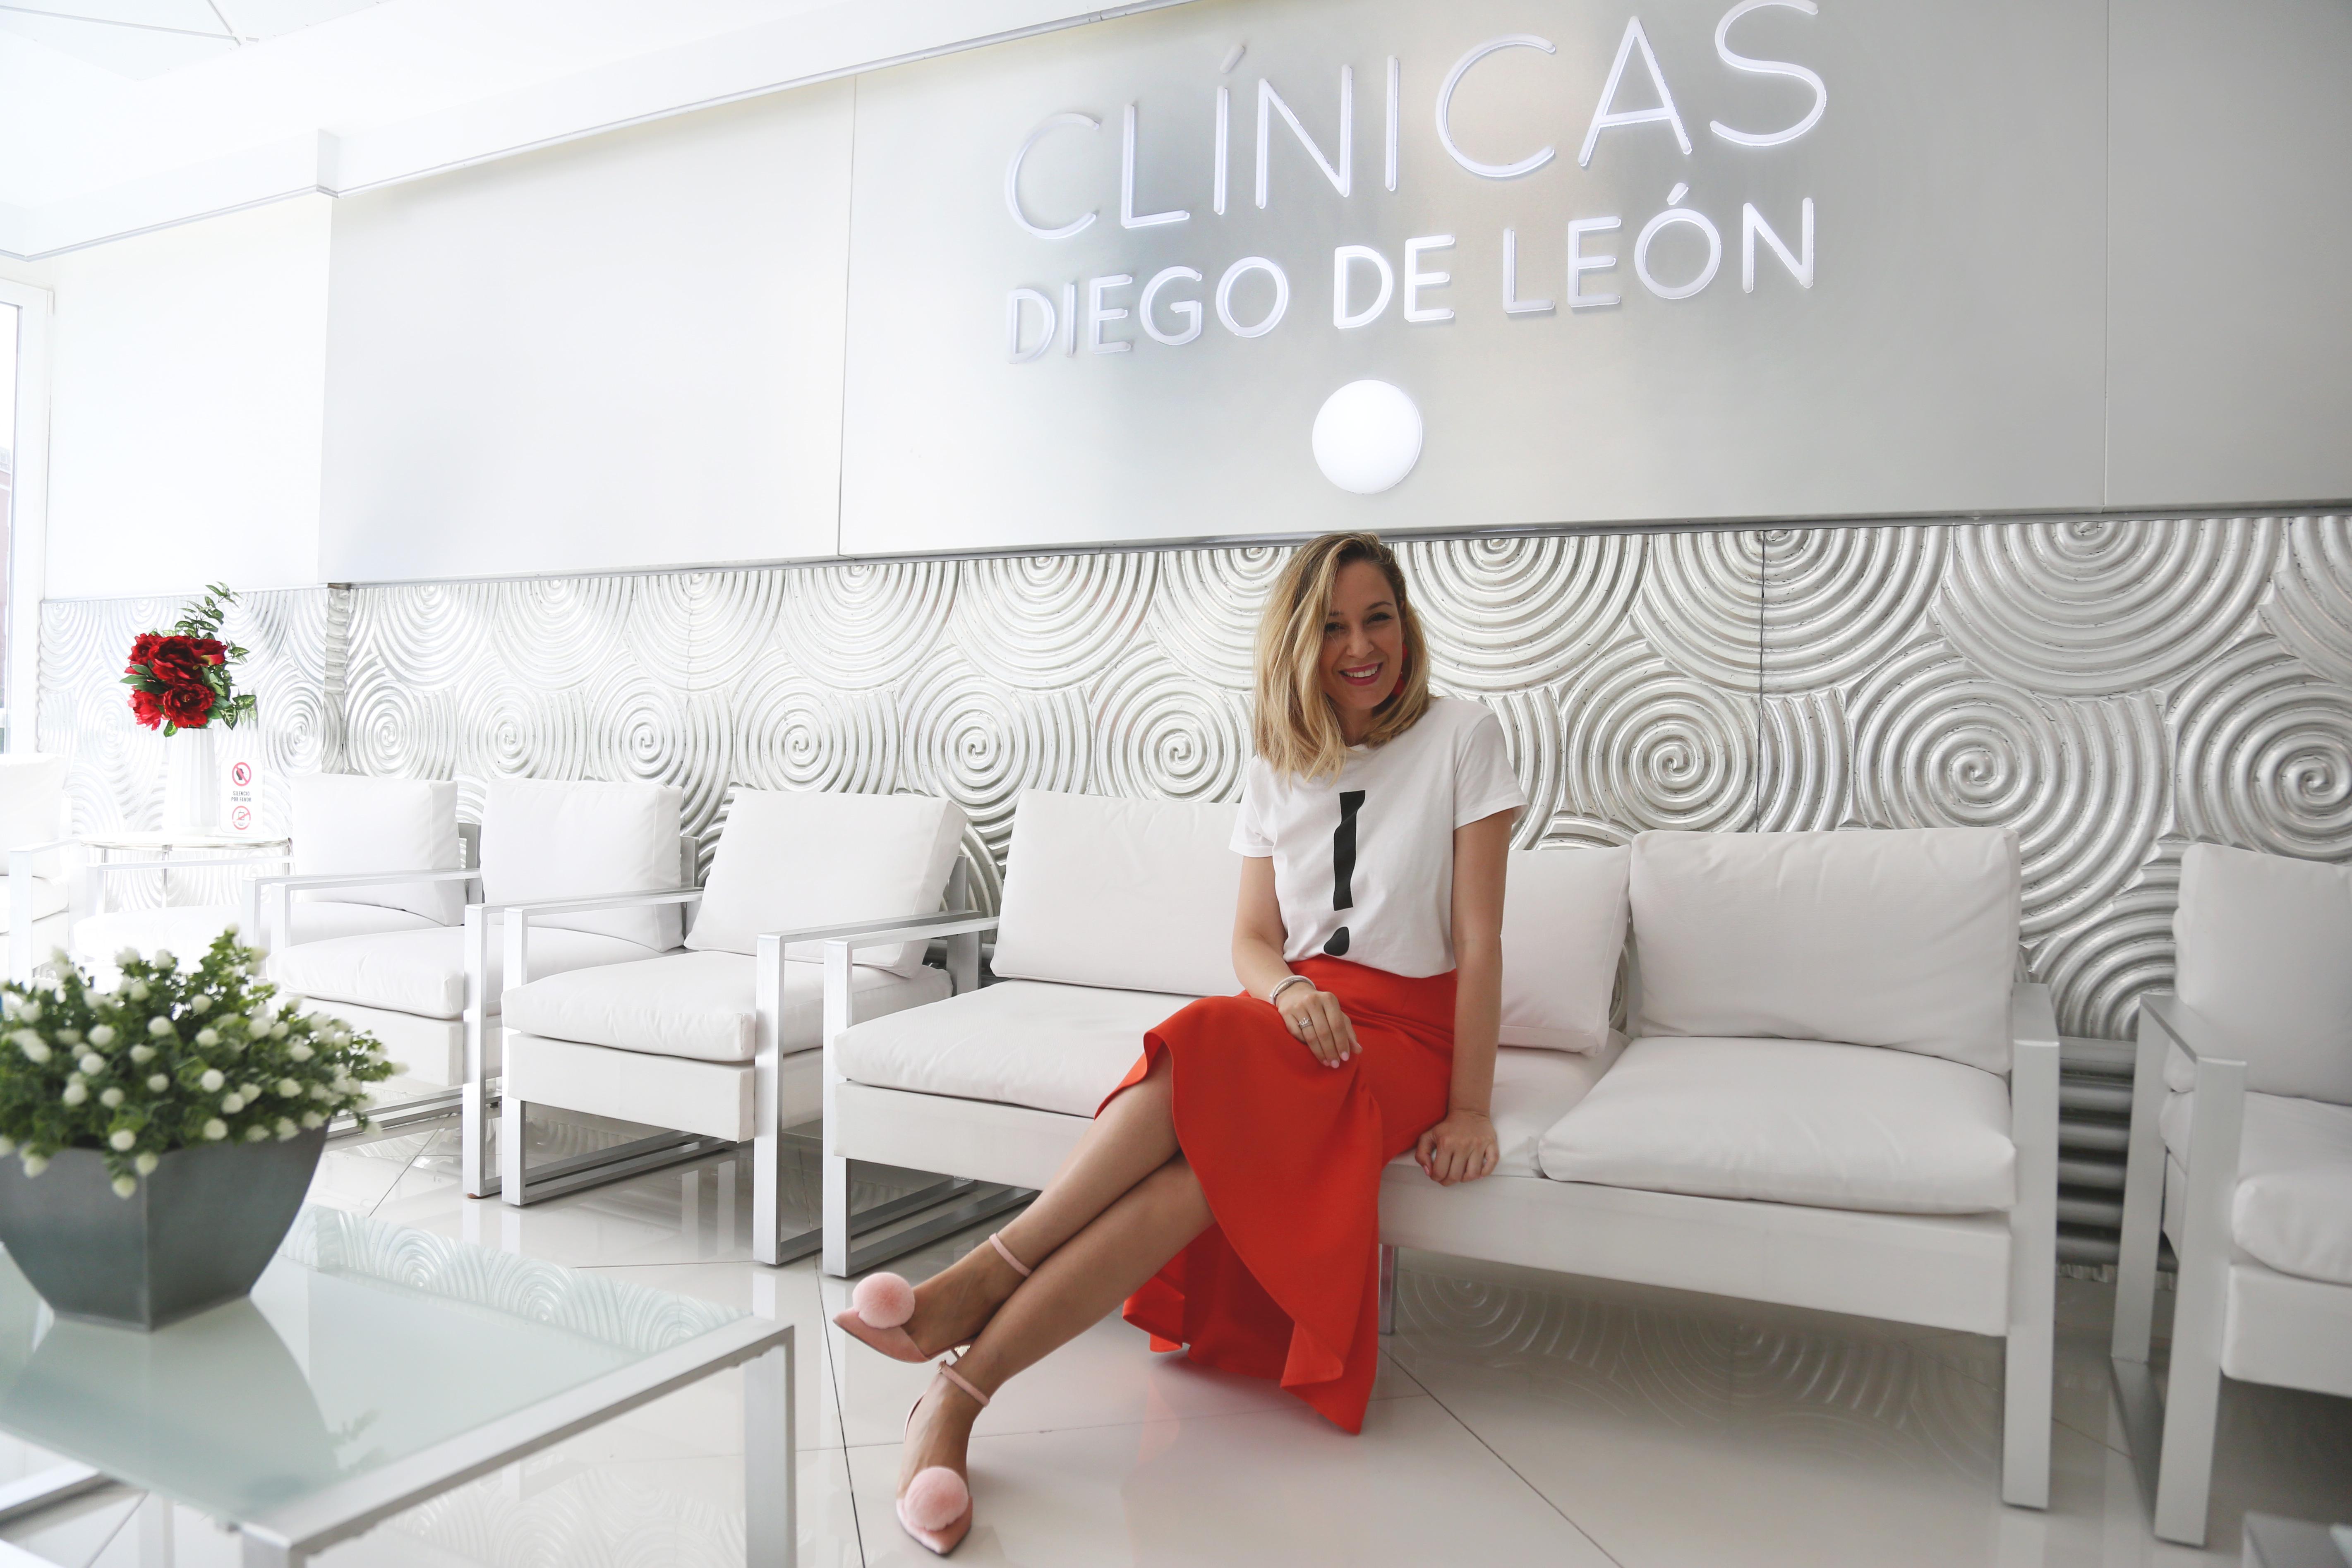 Clinica estetica Diego de Leon